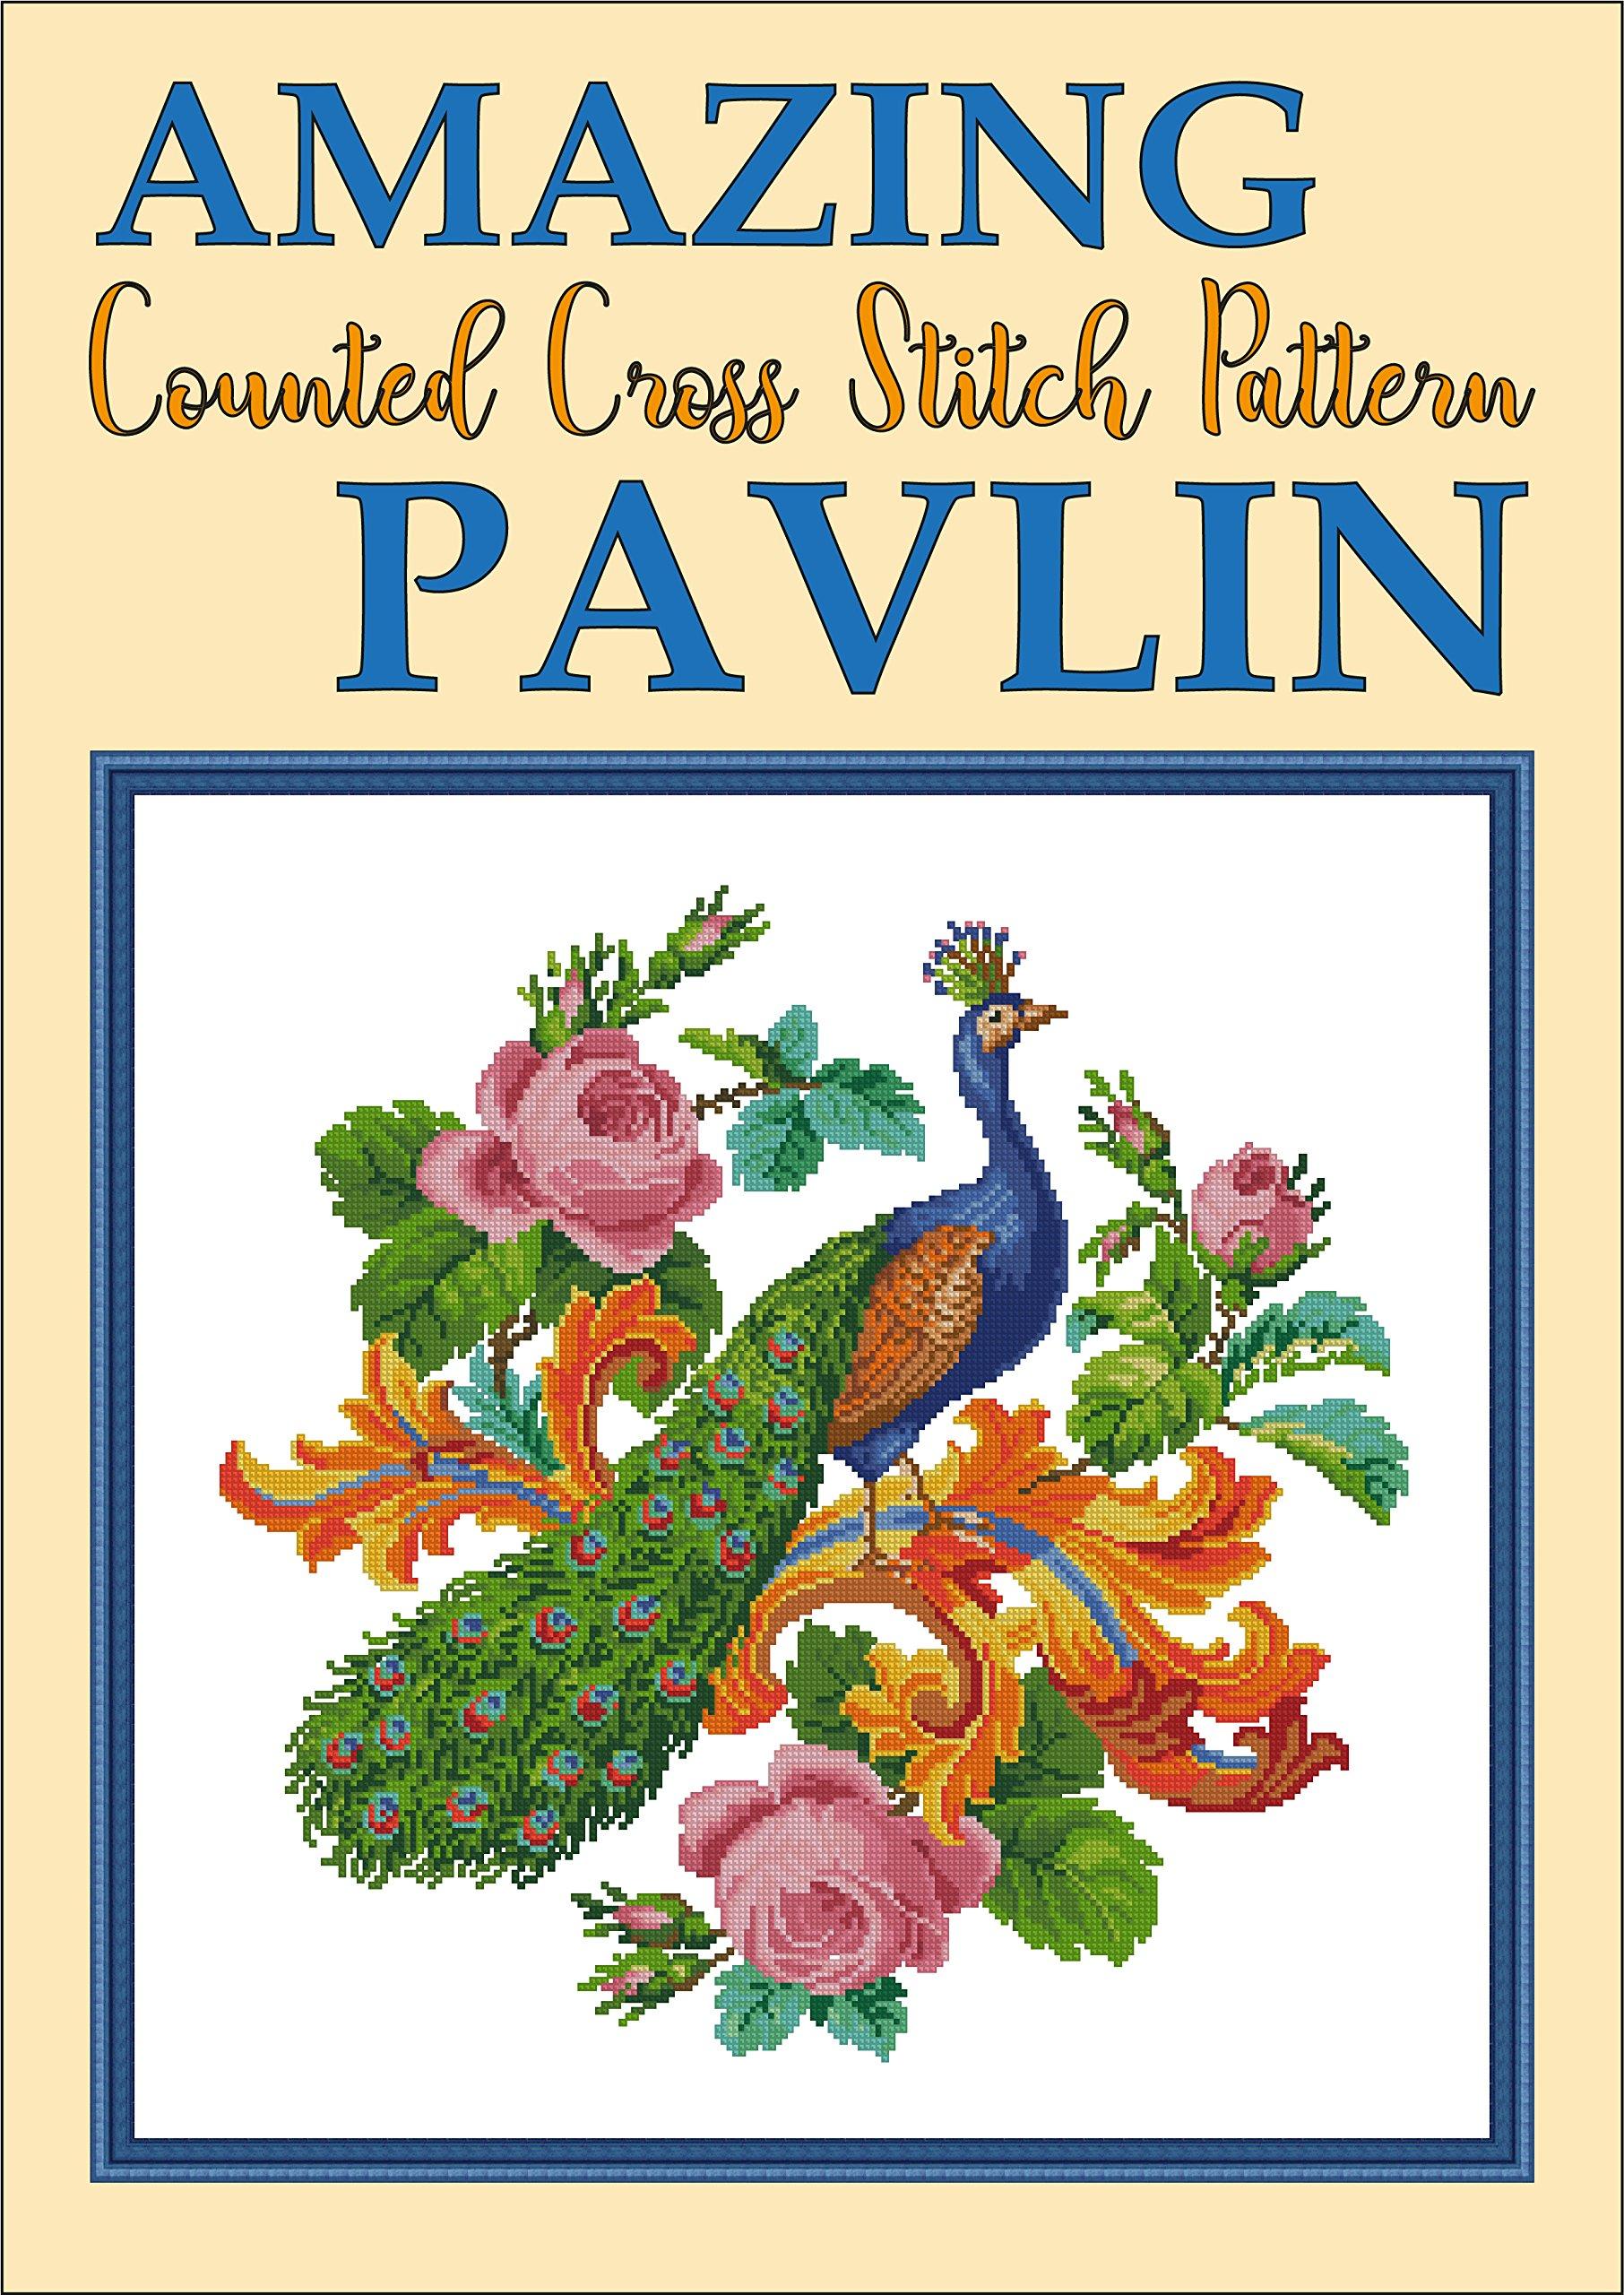 Modern Cross Stitch Patterns Catalog Of Patterns